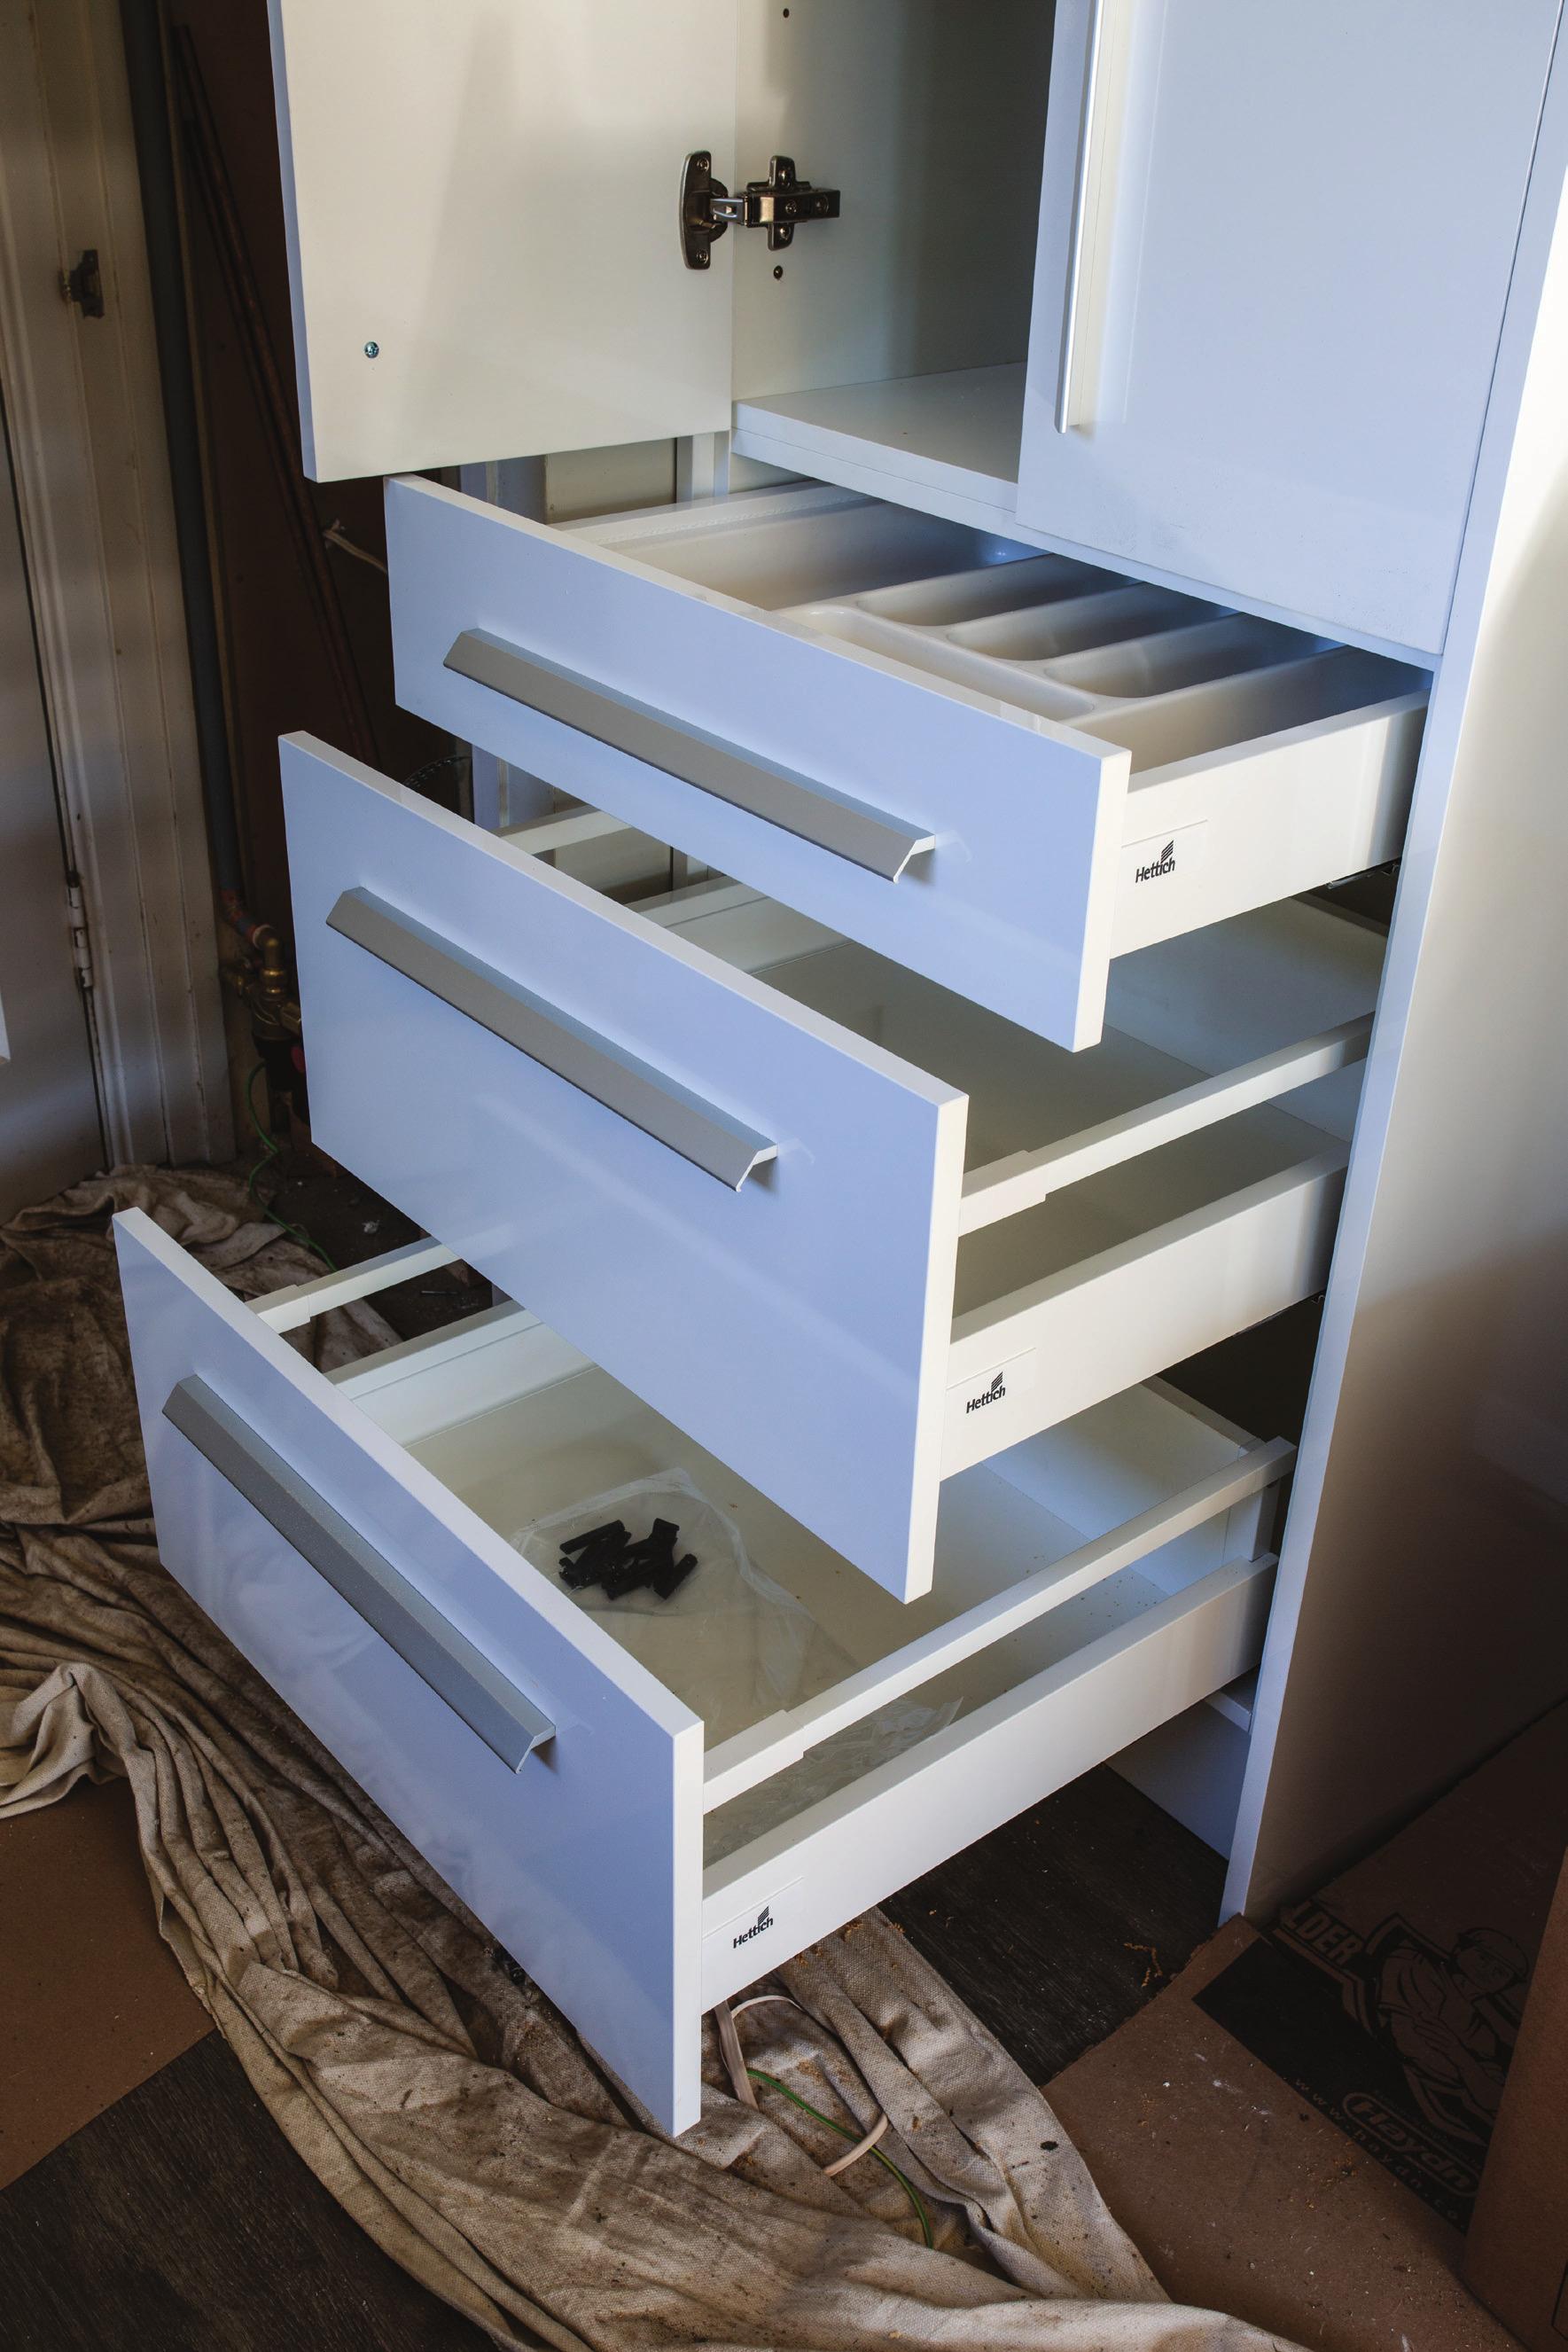 Shed_079_20180611_Installing-a-Kitchen-025.jpg